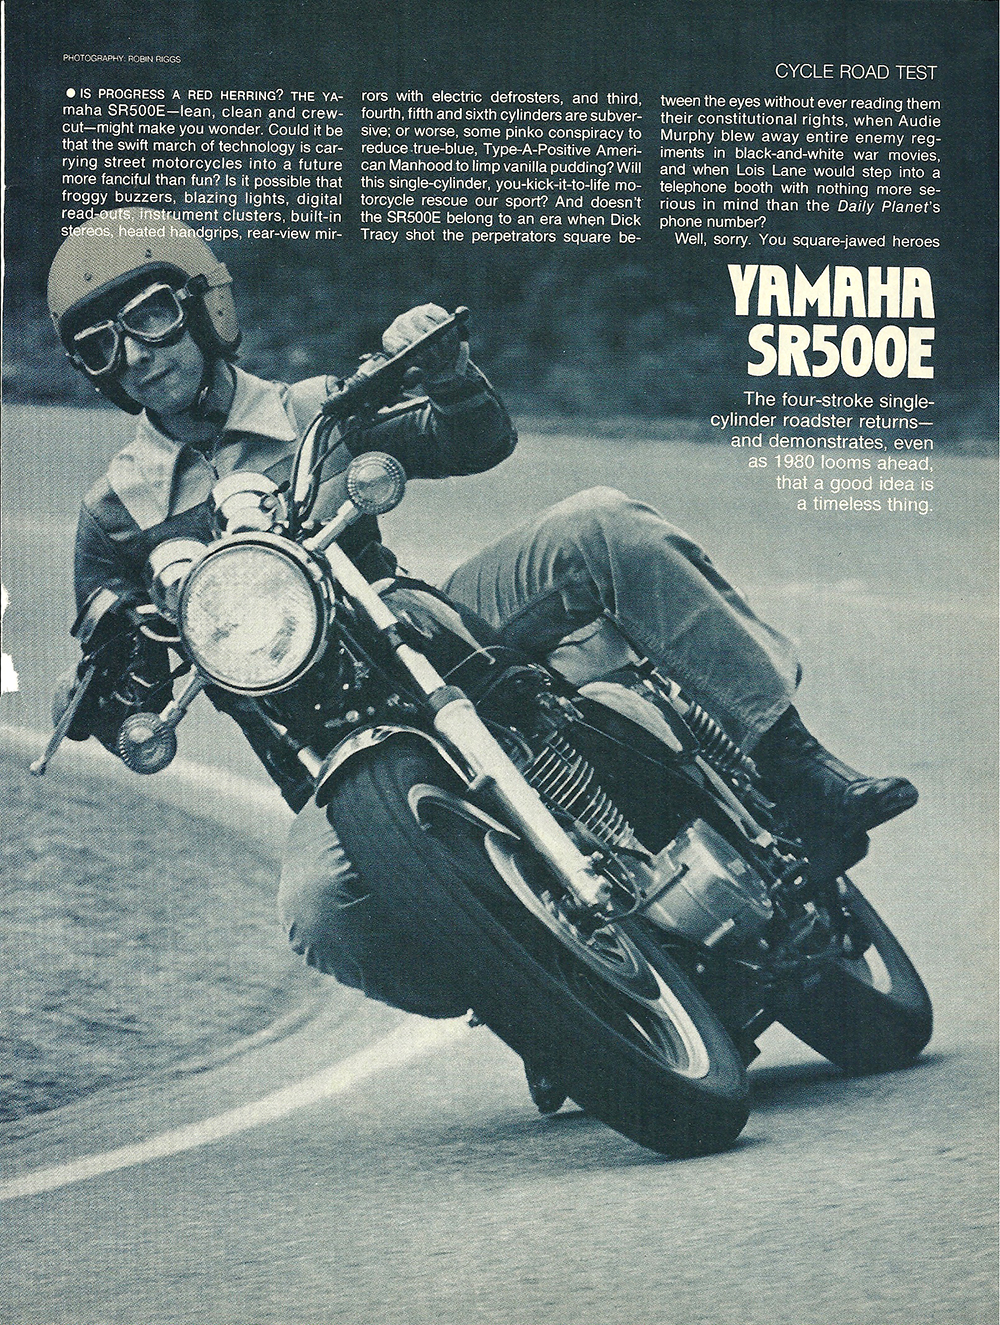 1978 Yamaha SR500E road test 1.jpg